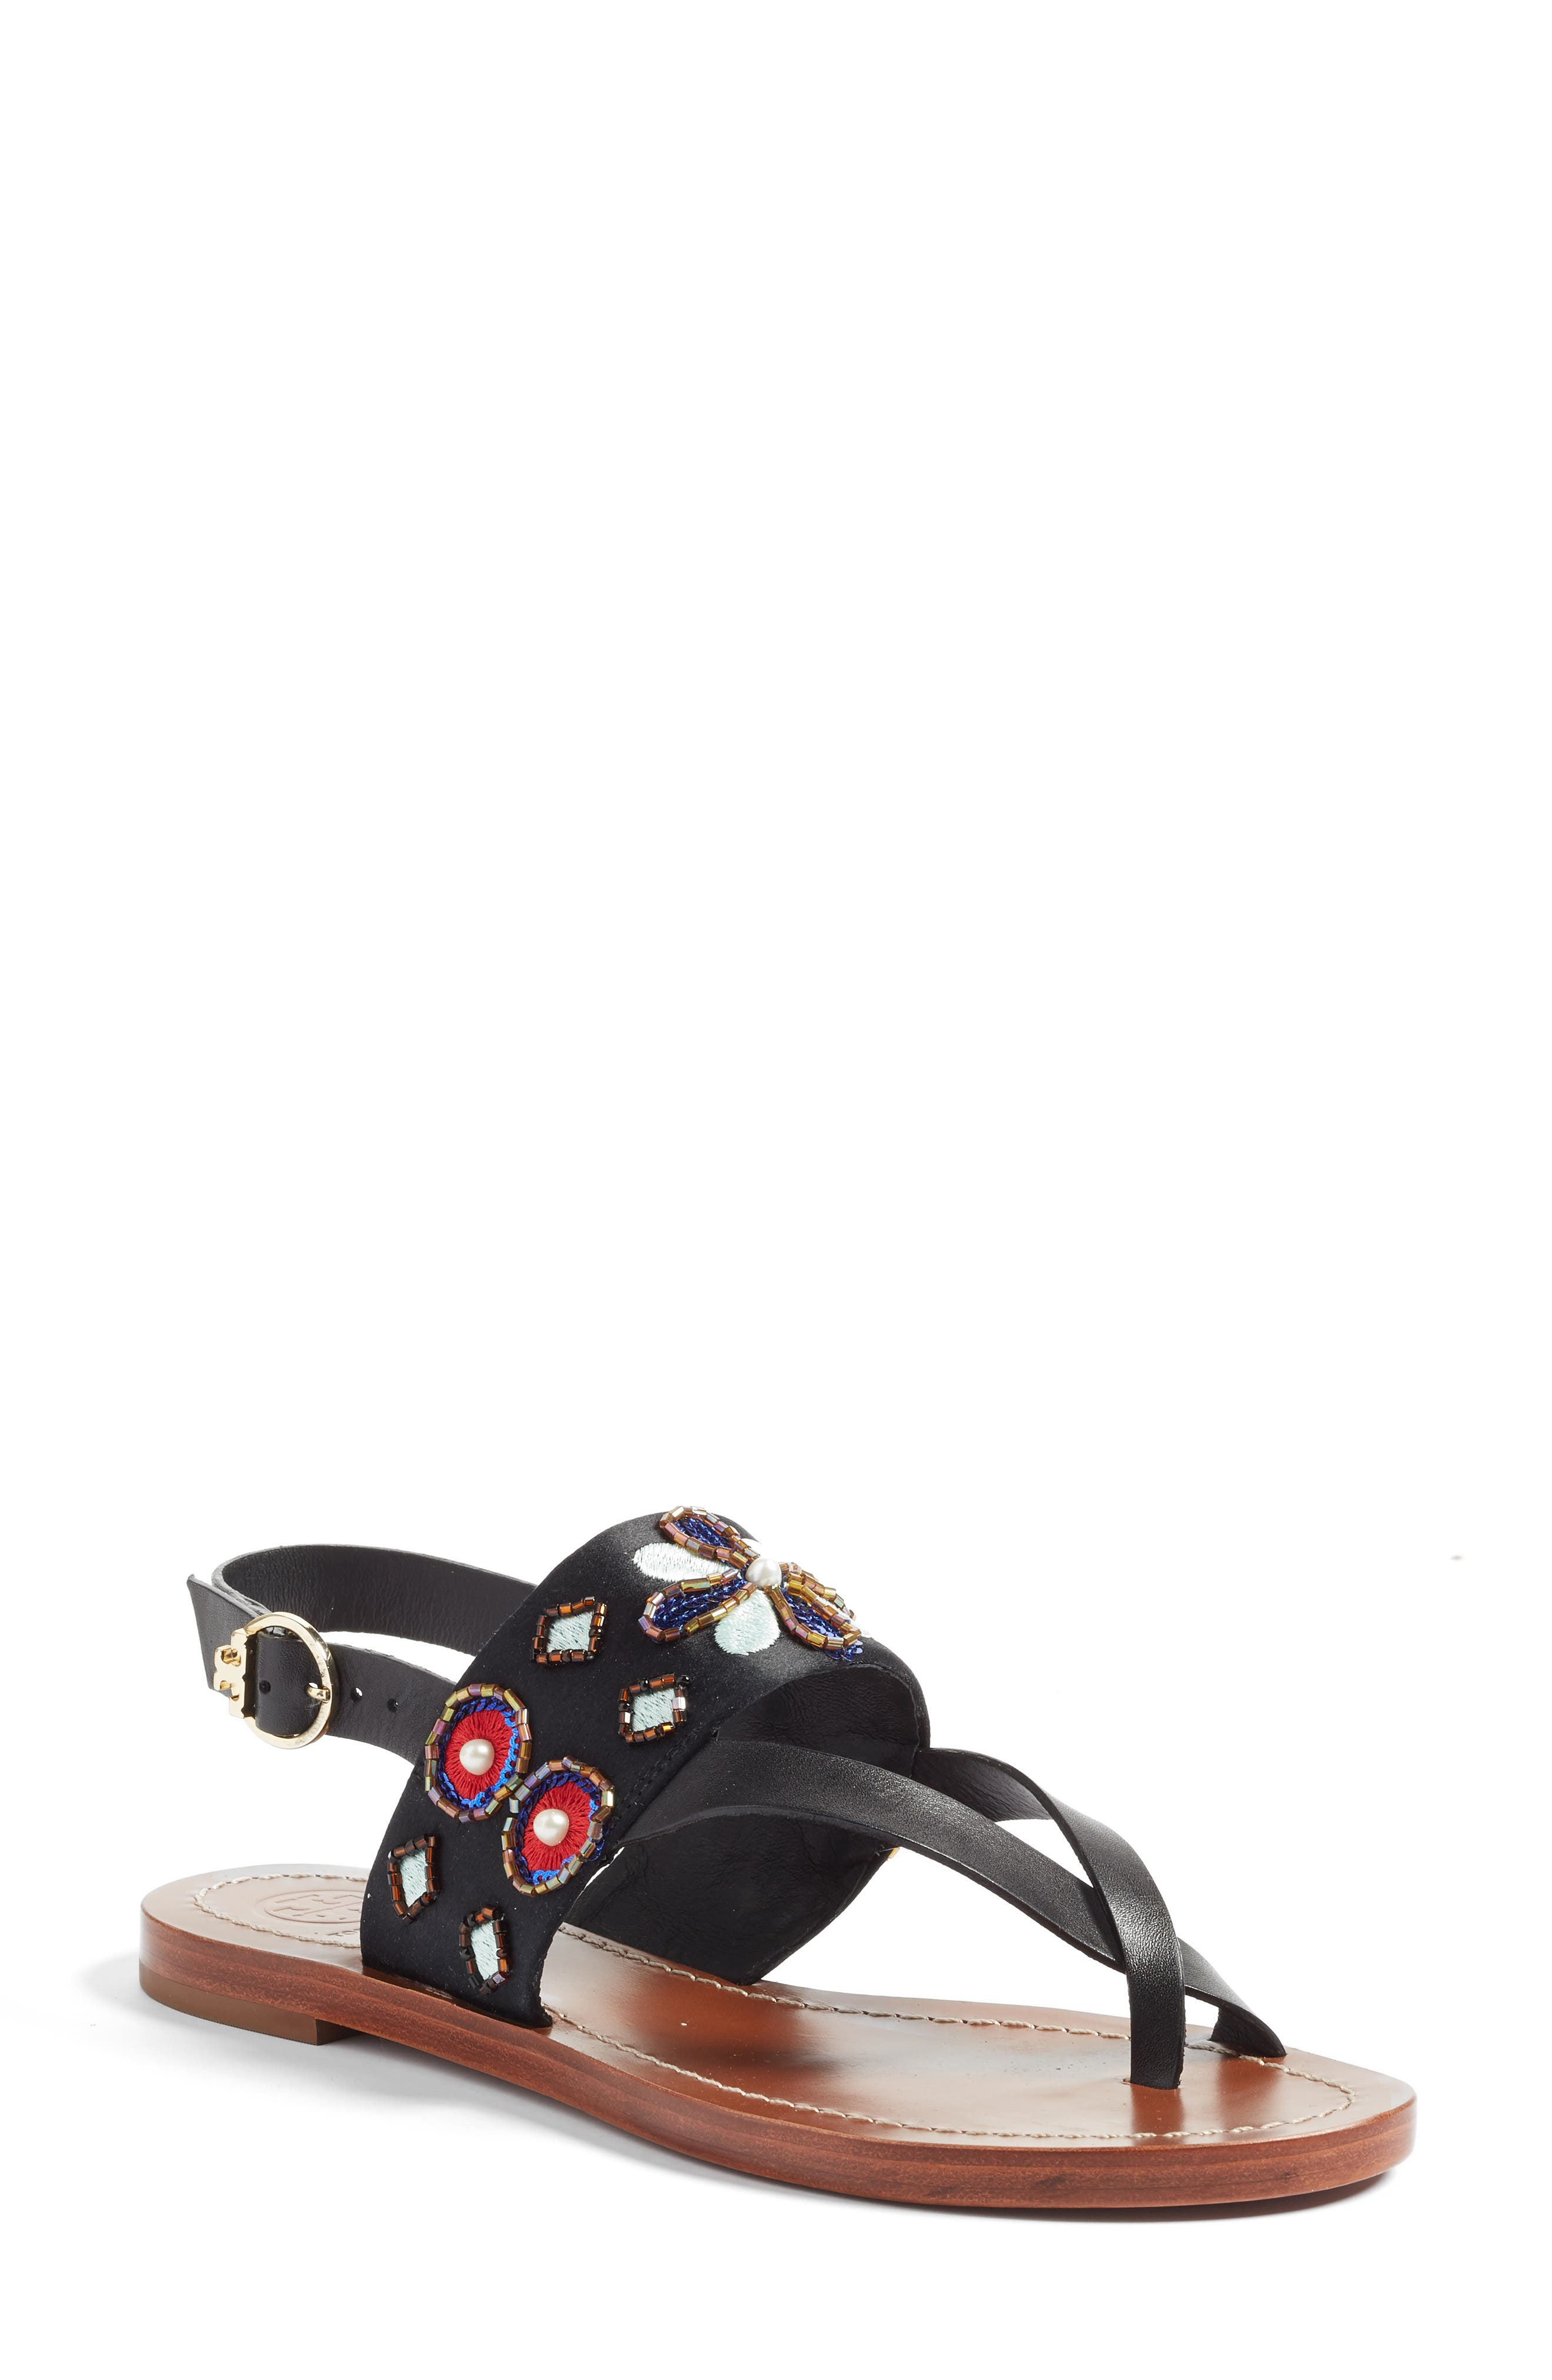 TORY BURCH Estella Embellished Sandal